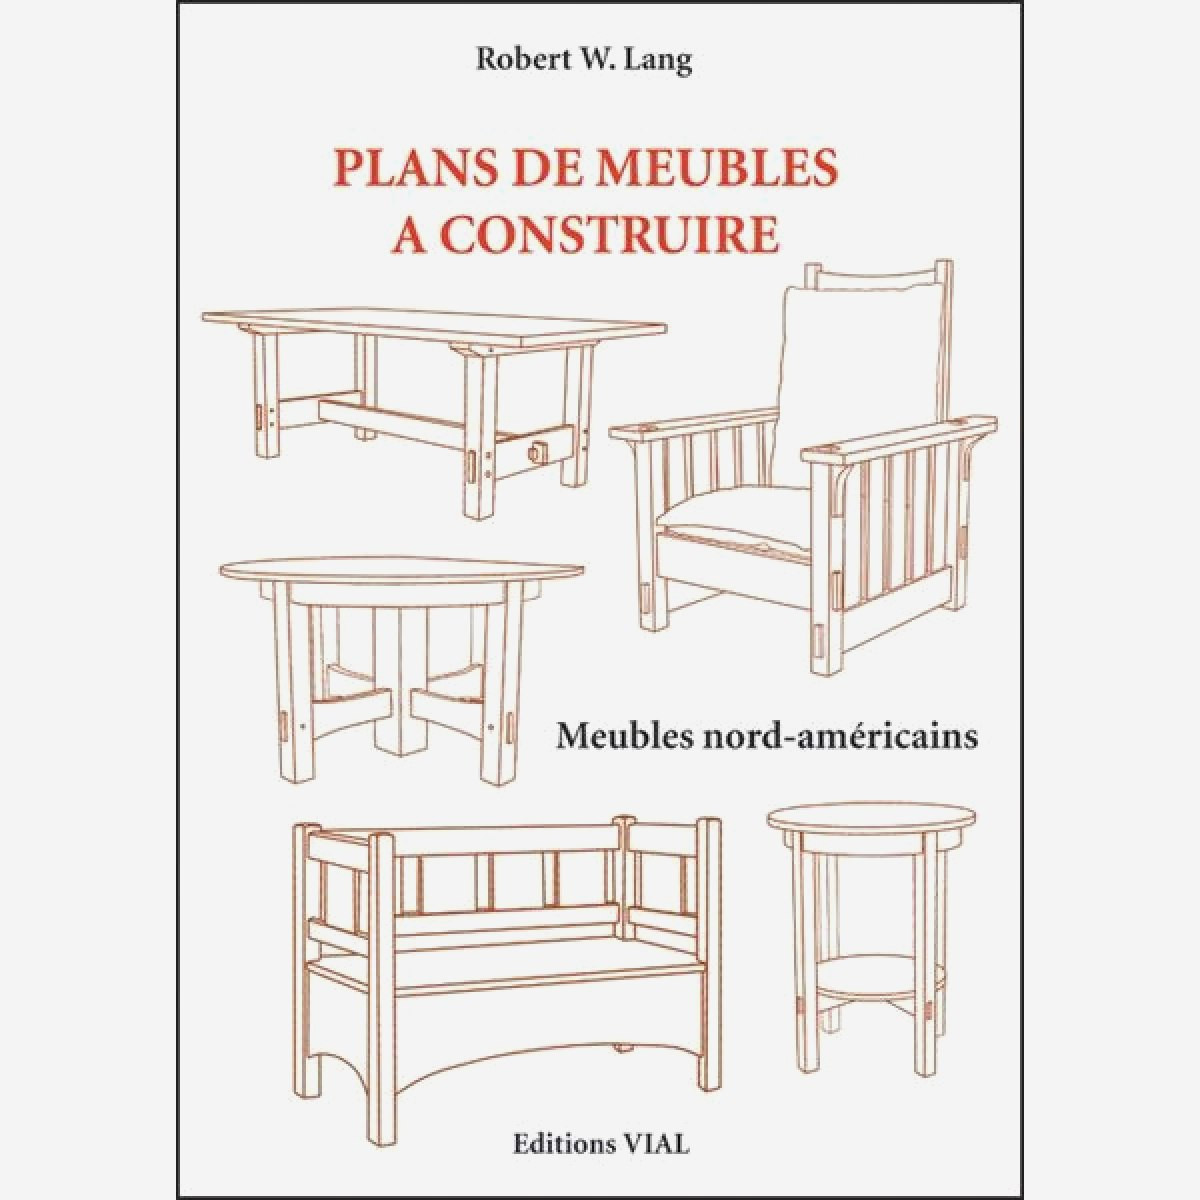 fauteuil en palette plan genial 59 plan meuble palette pdf de fauteuil en palette plan